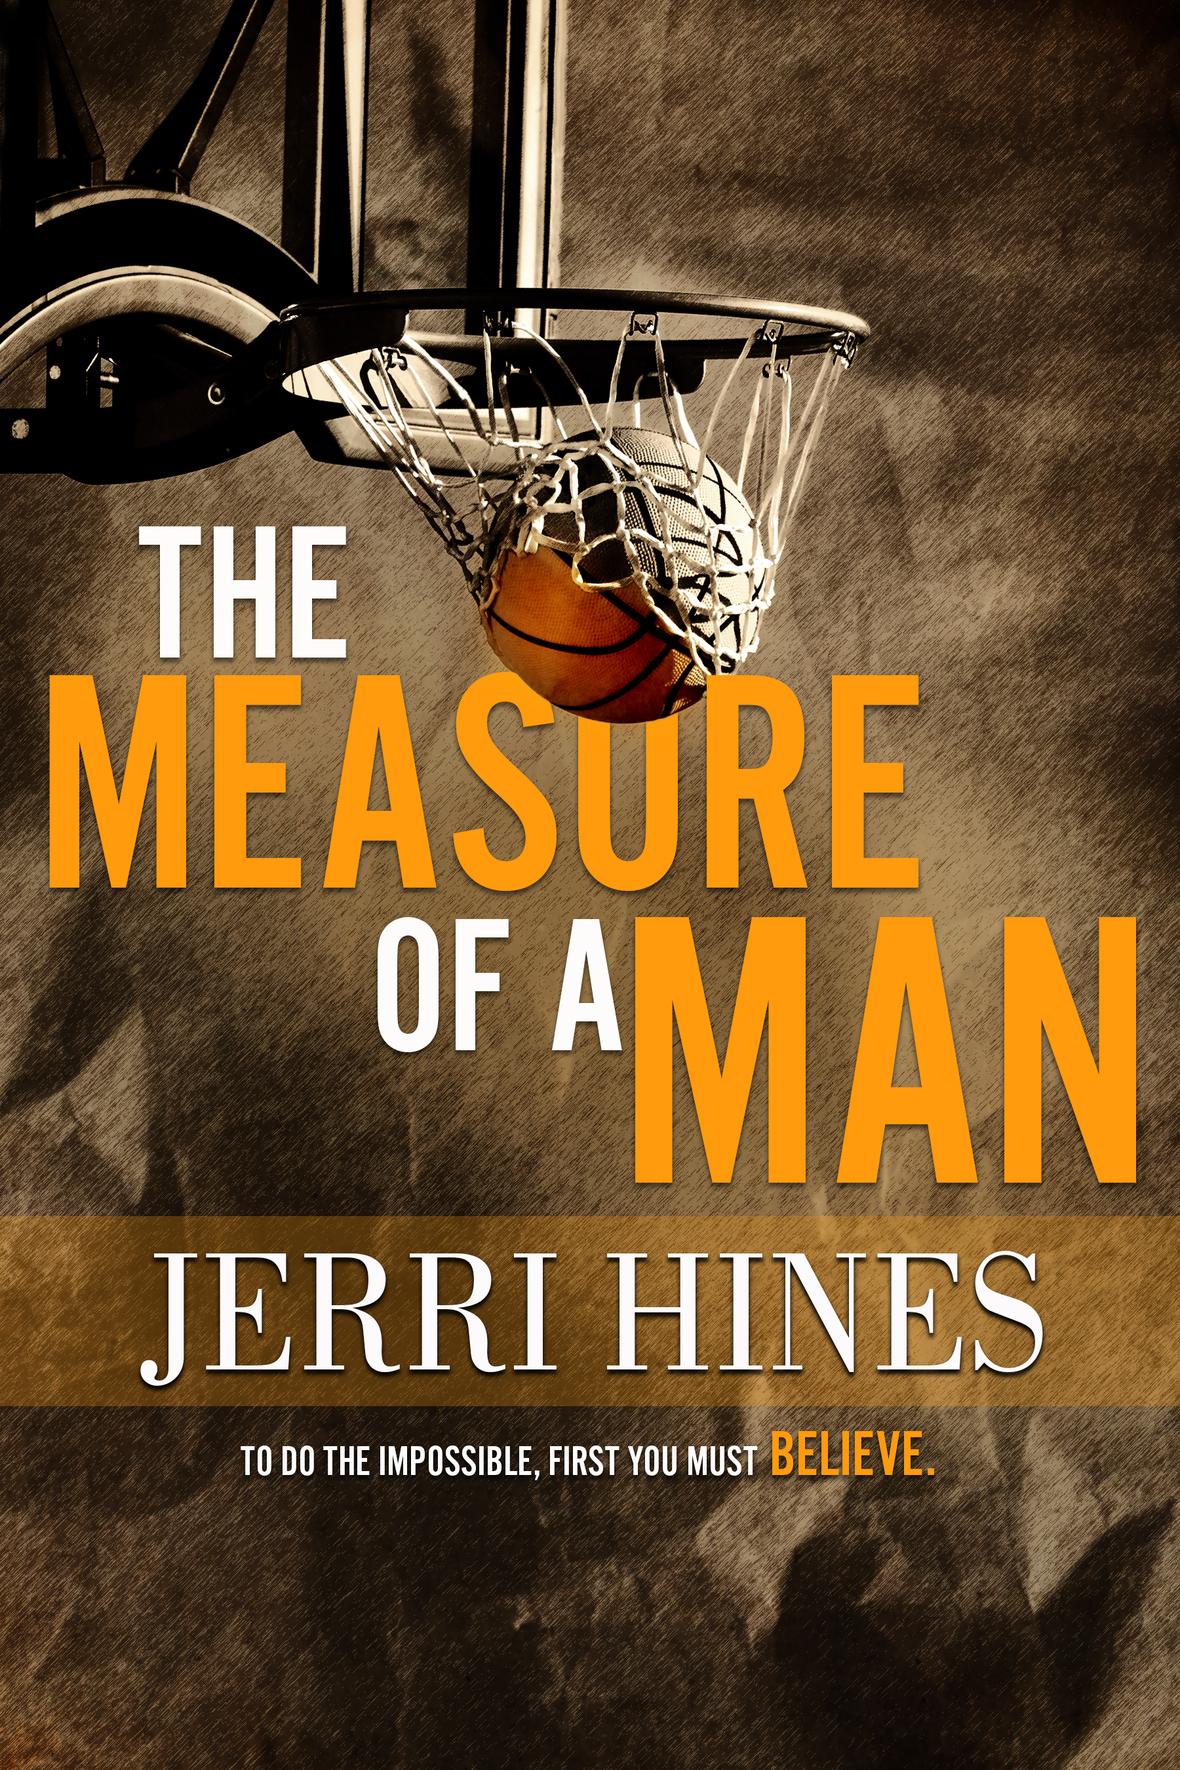 MeasureofaMan The 1